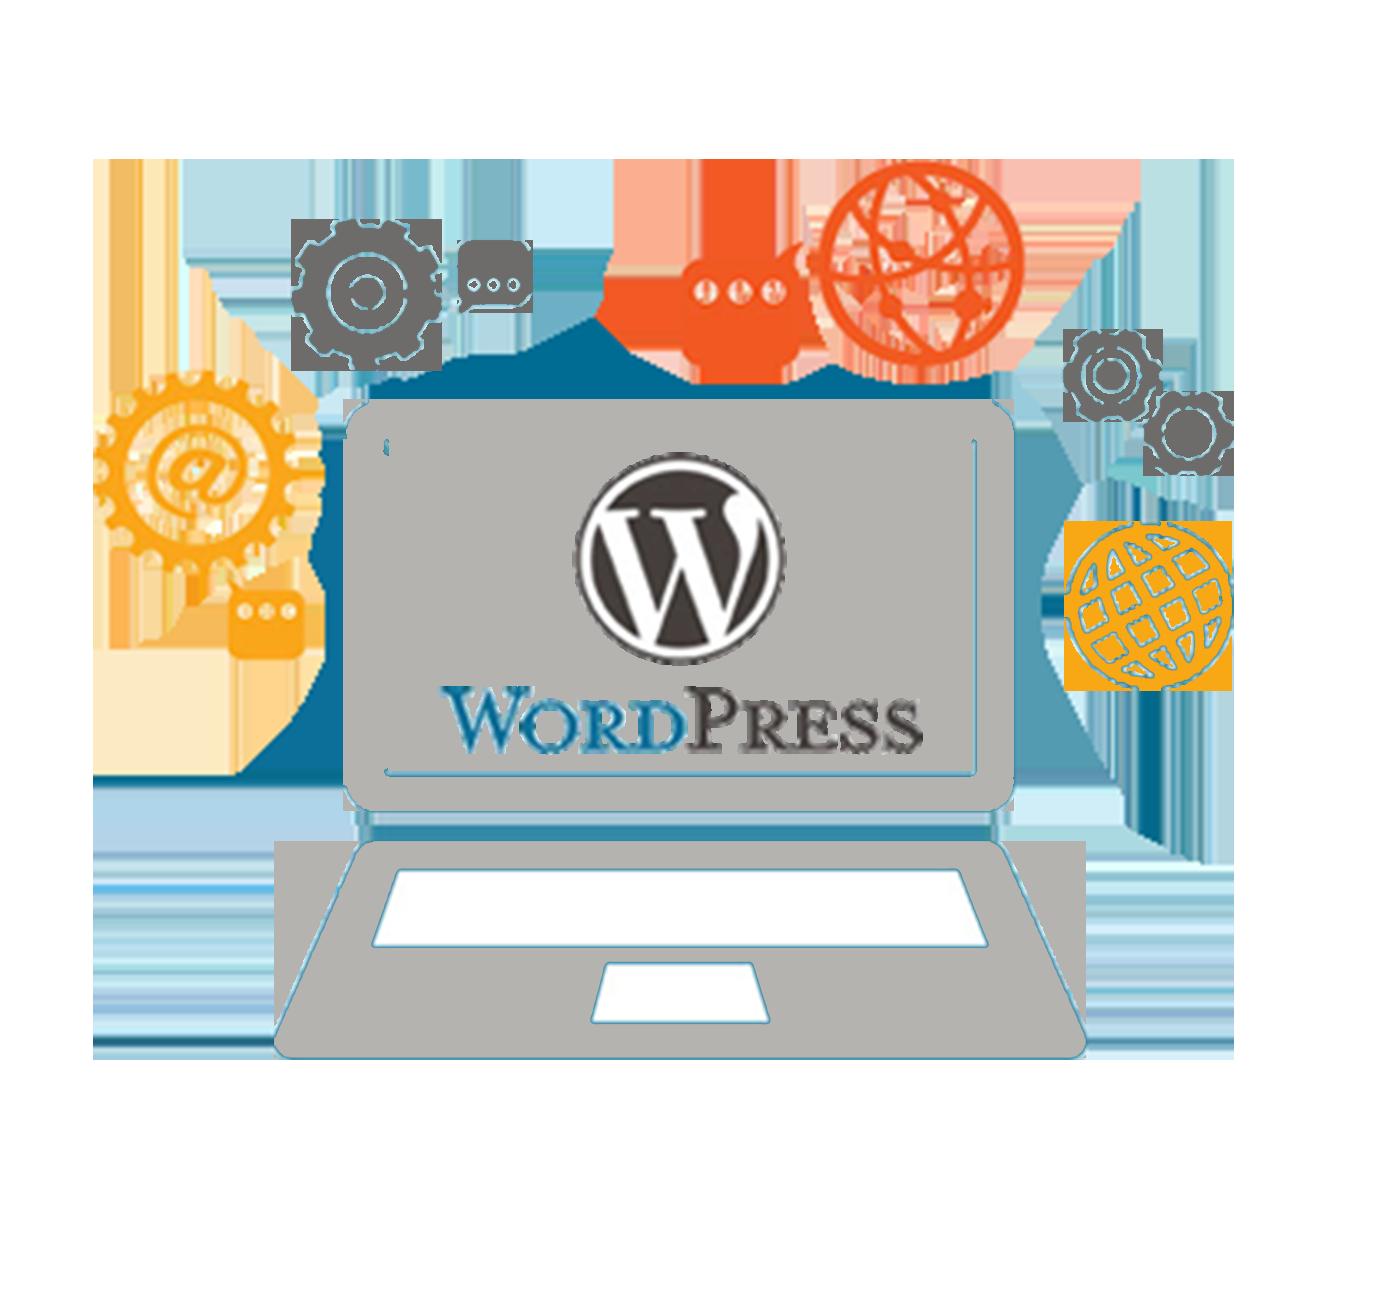 website development services wordpress in pune